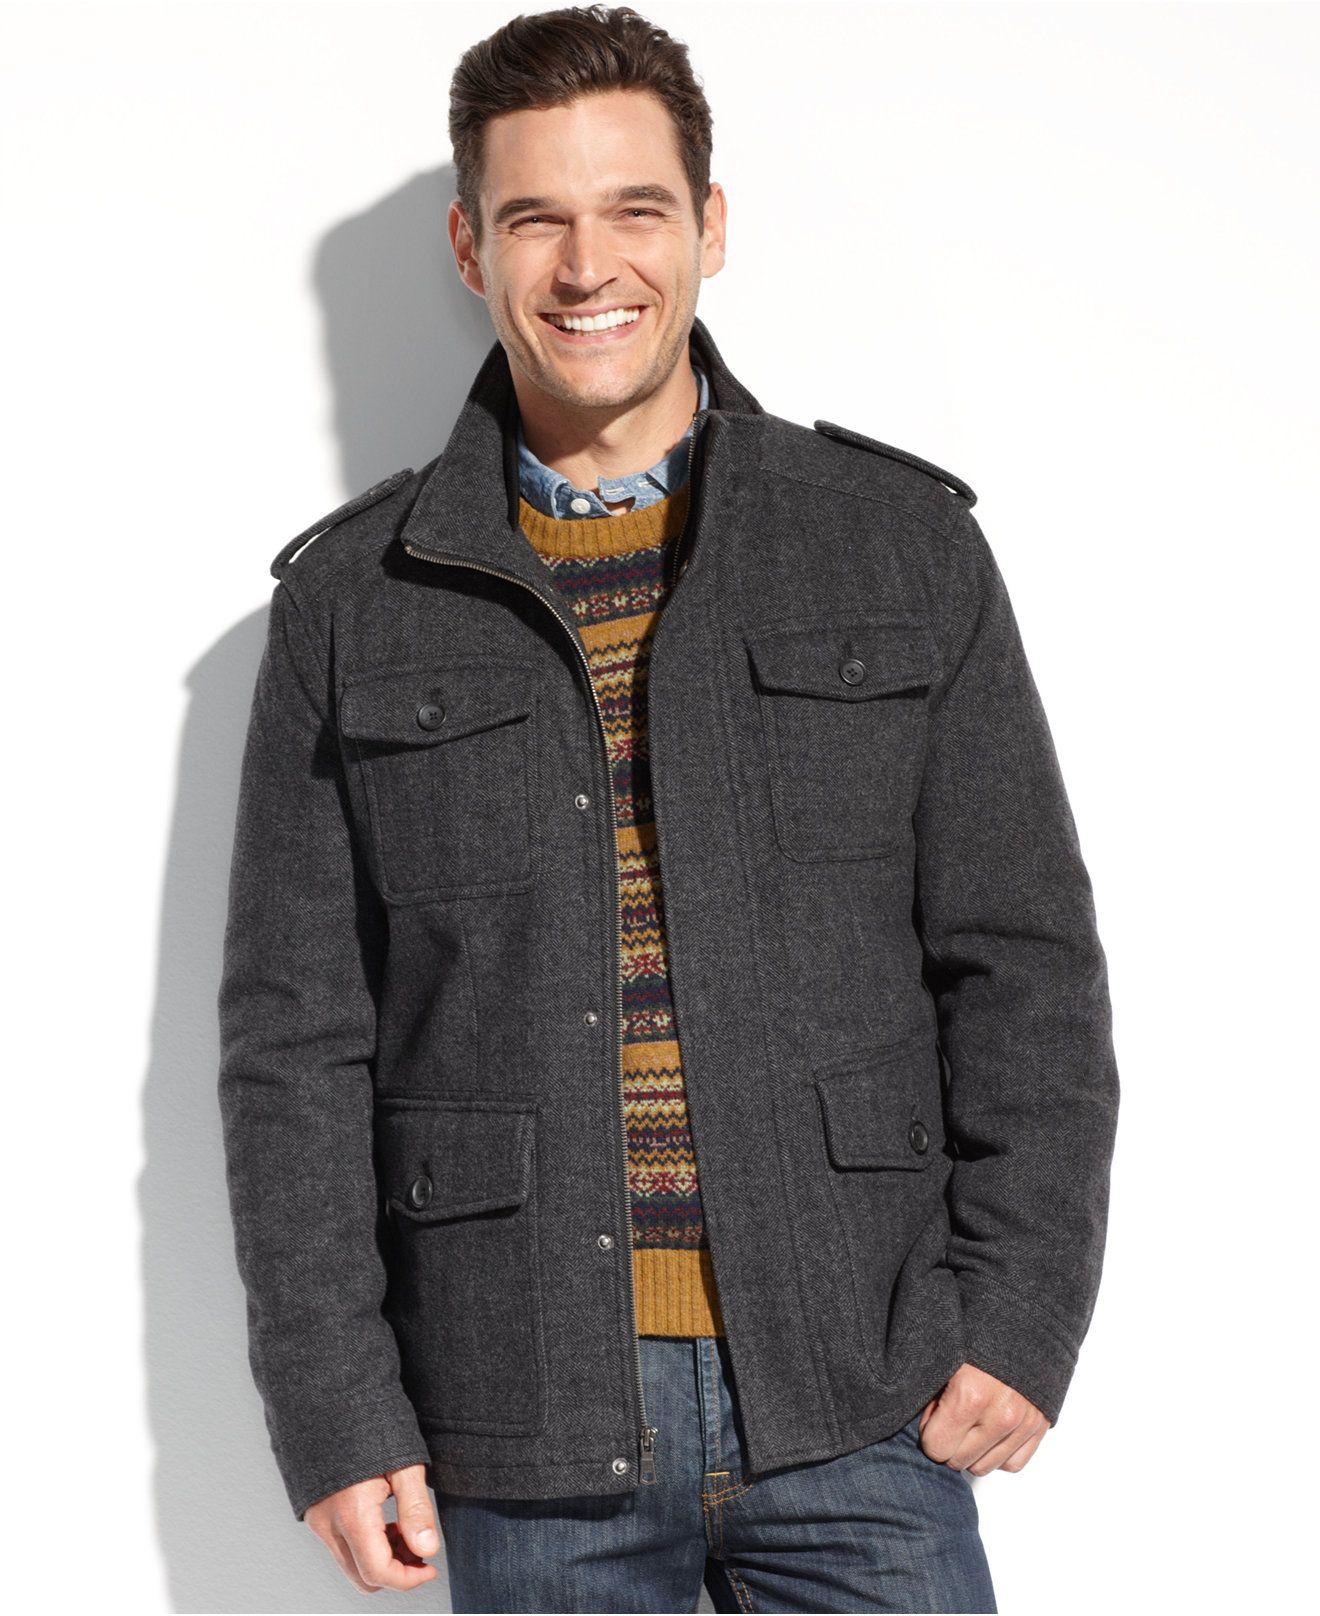 953f279a Tommy Hilfiger Coat, Melton Wool Military 4-Pocket Coat - Coats & Jackets -  Men - Macy's